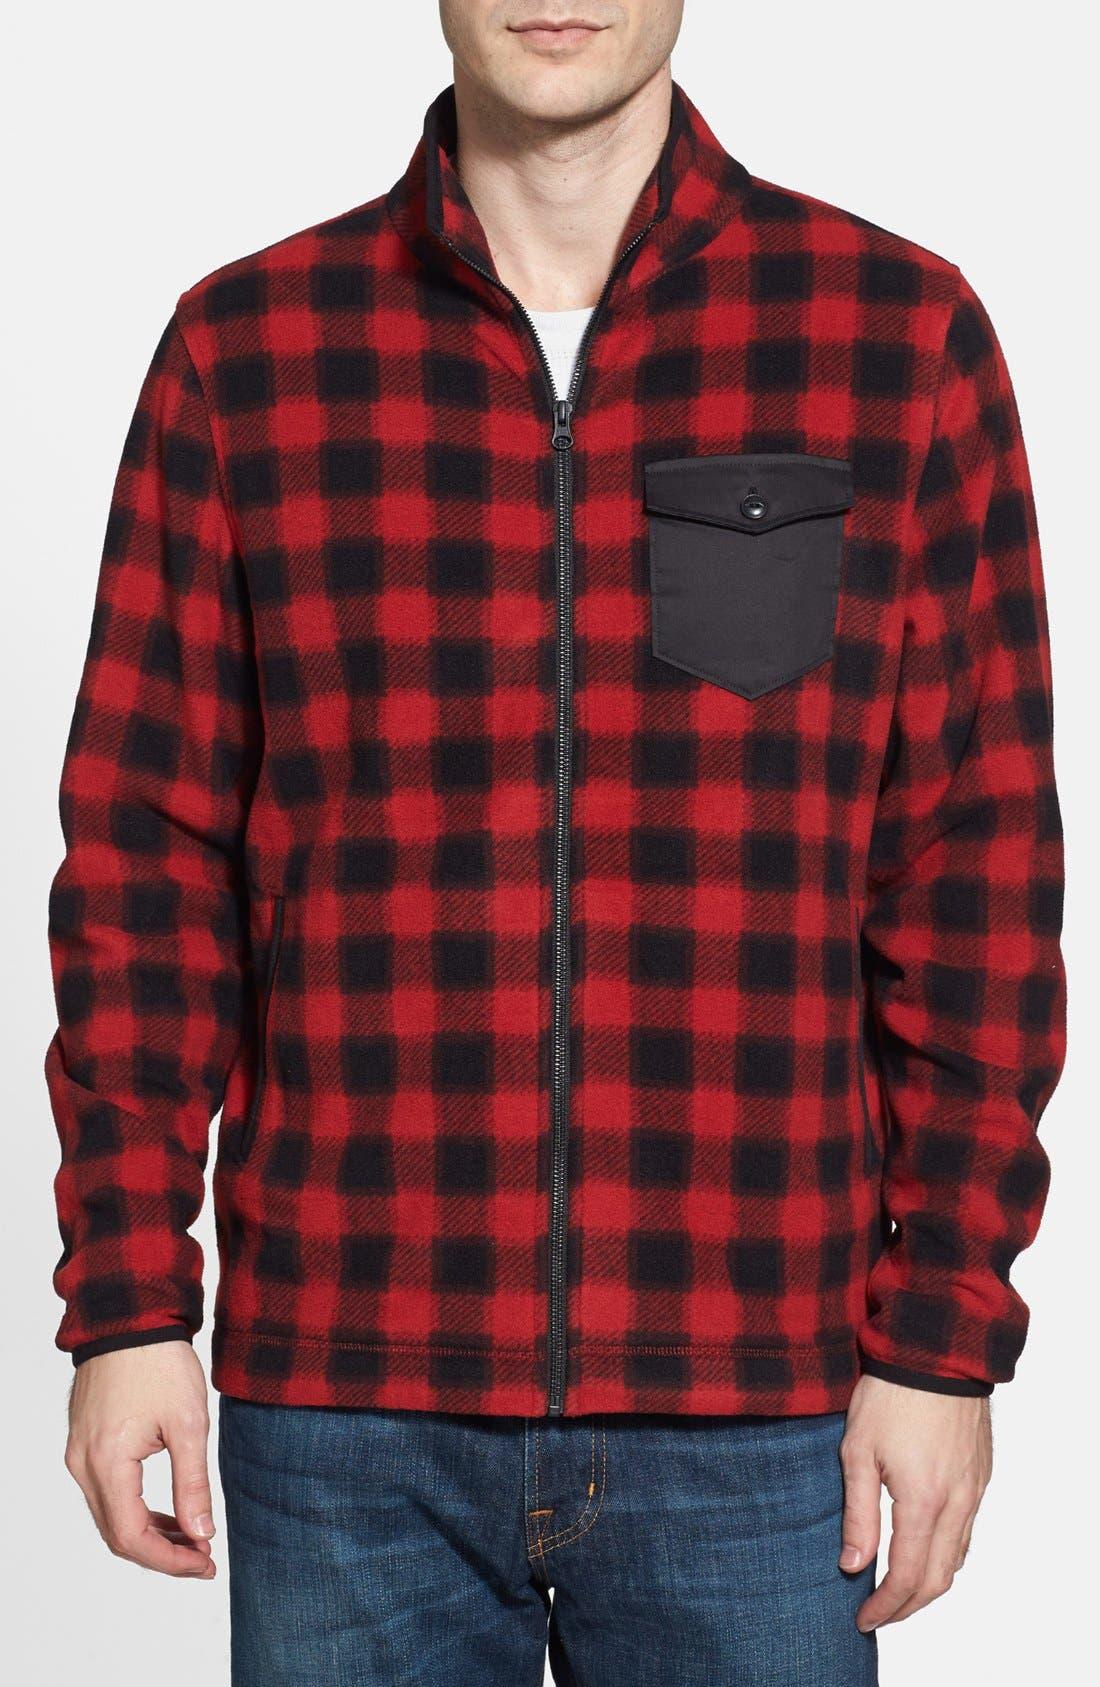 Alternate Image 1 Selected - Wallin & Bros. Trim Fit Plaid Full Zip Fleece